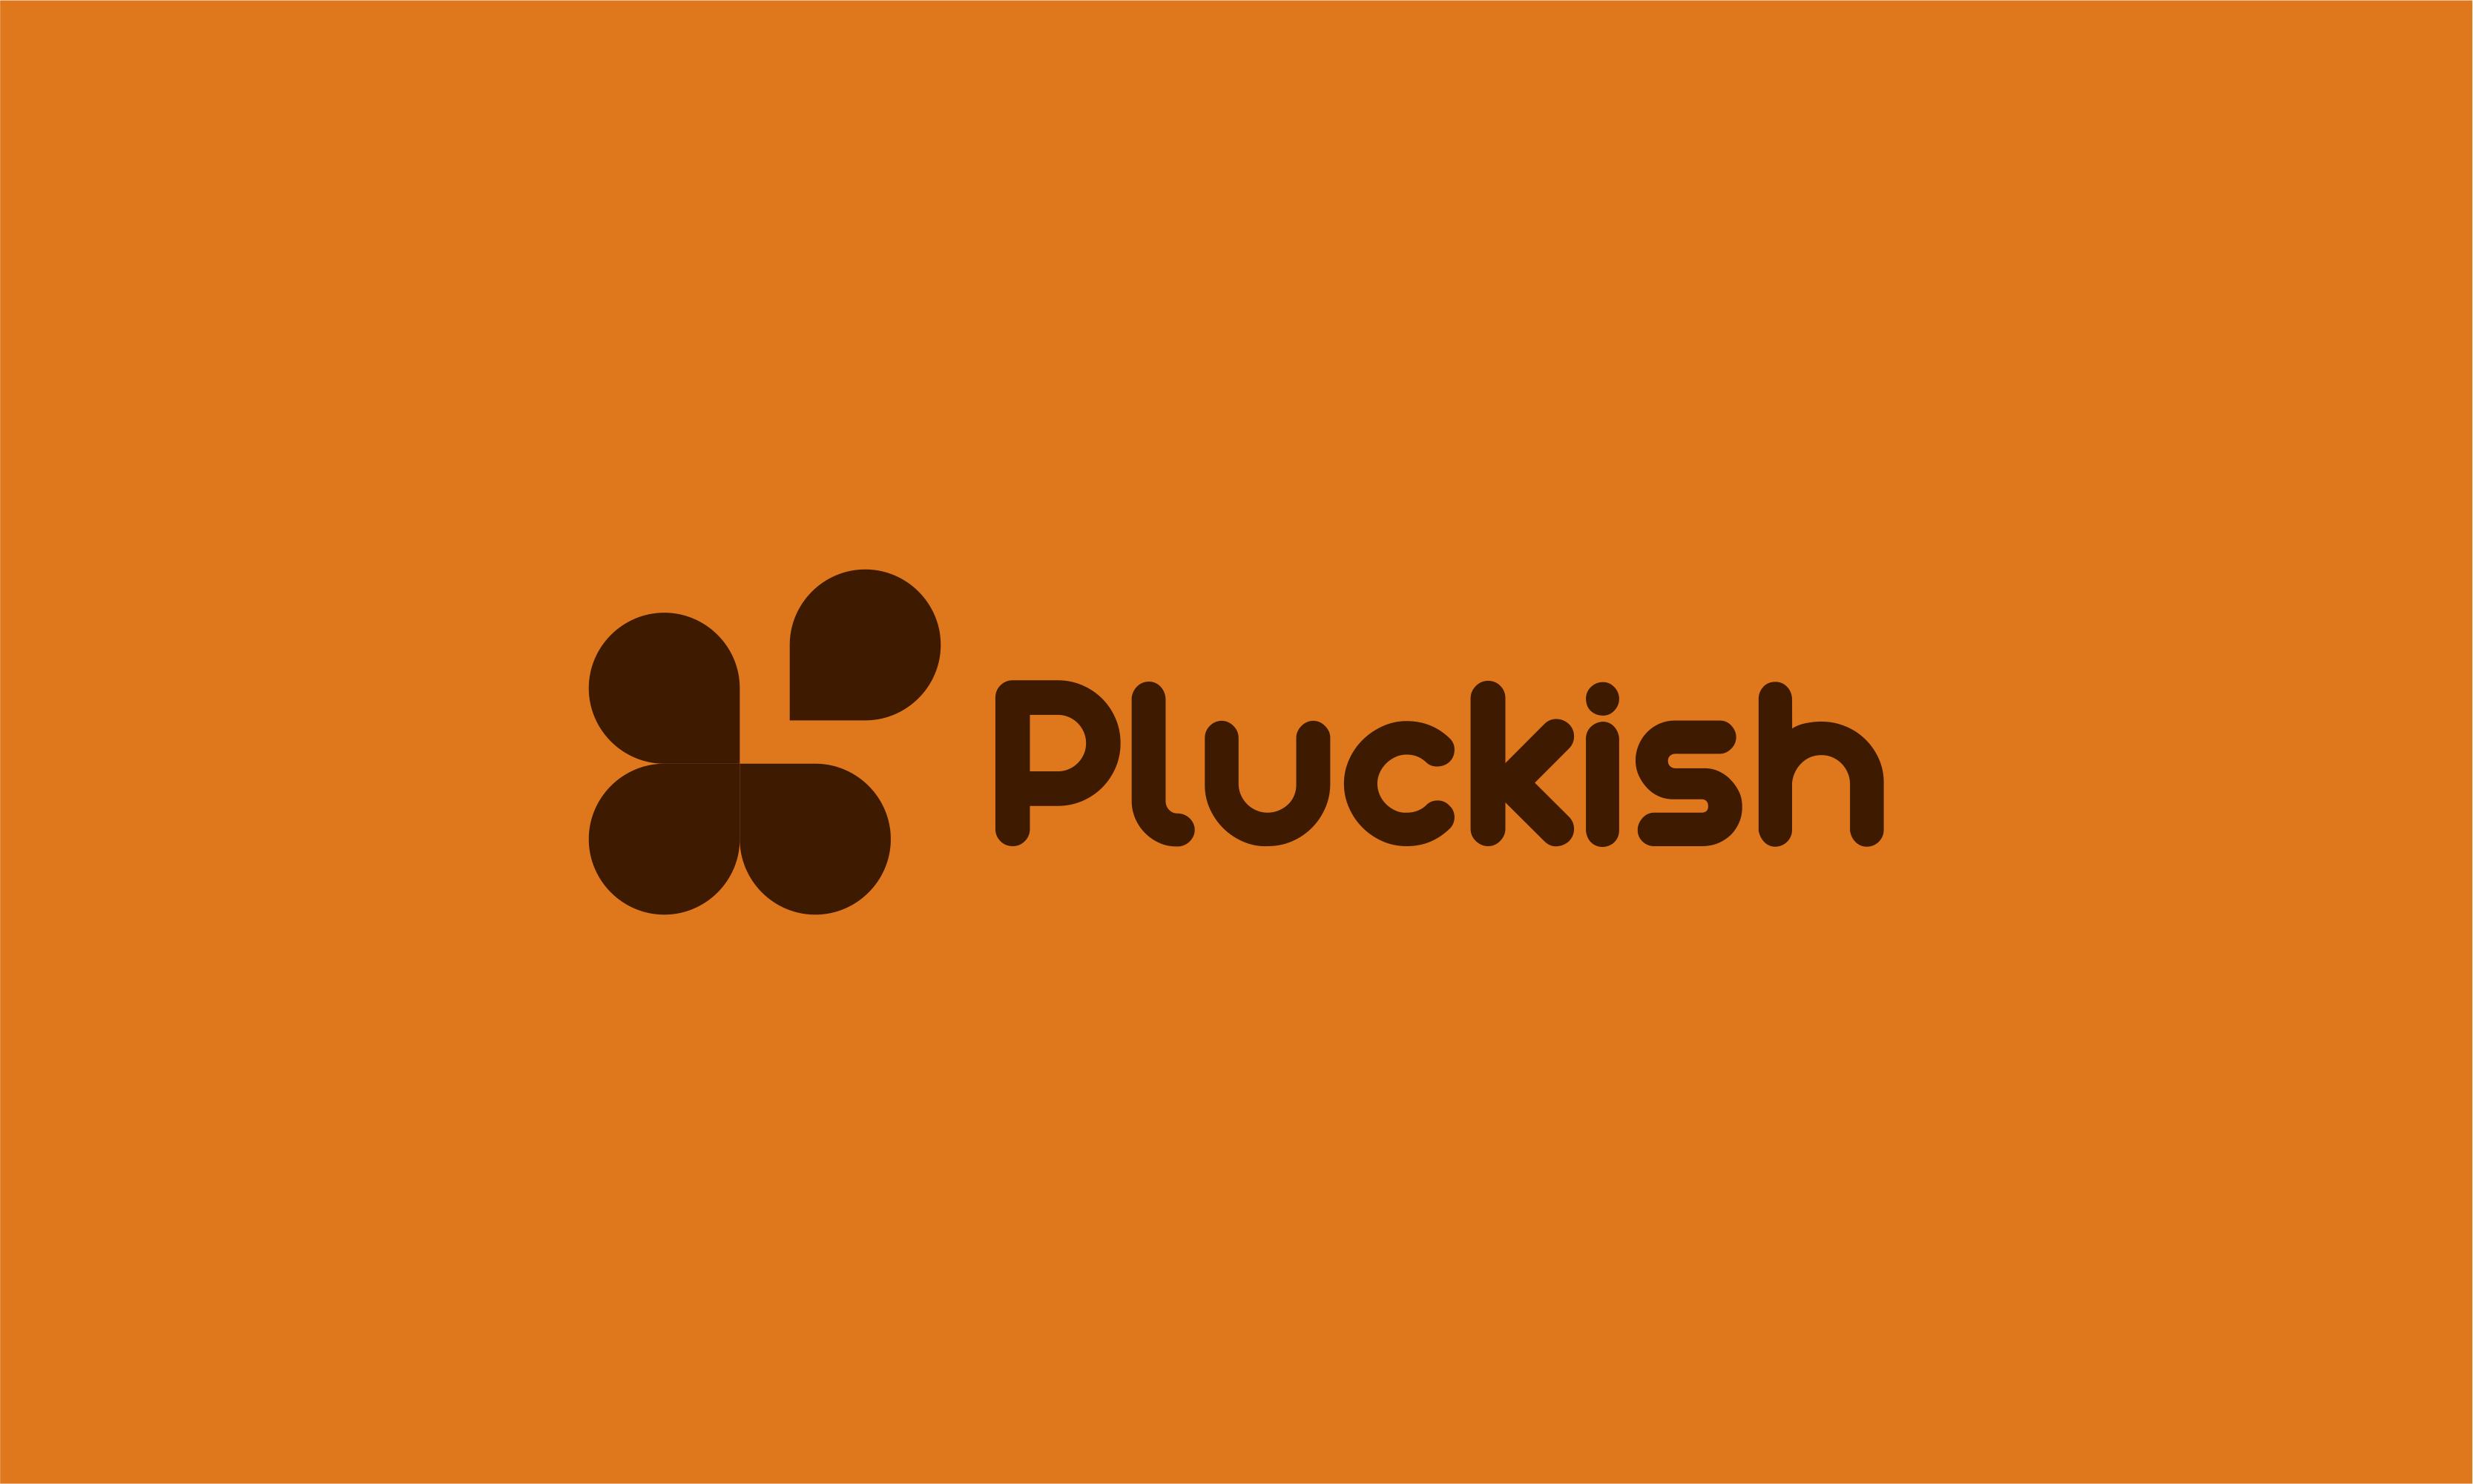 Pluckish